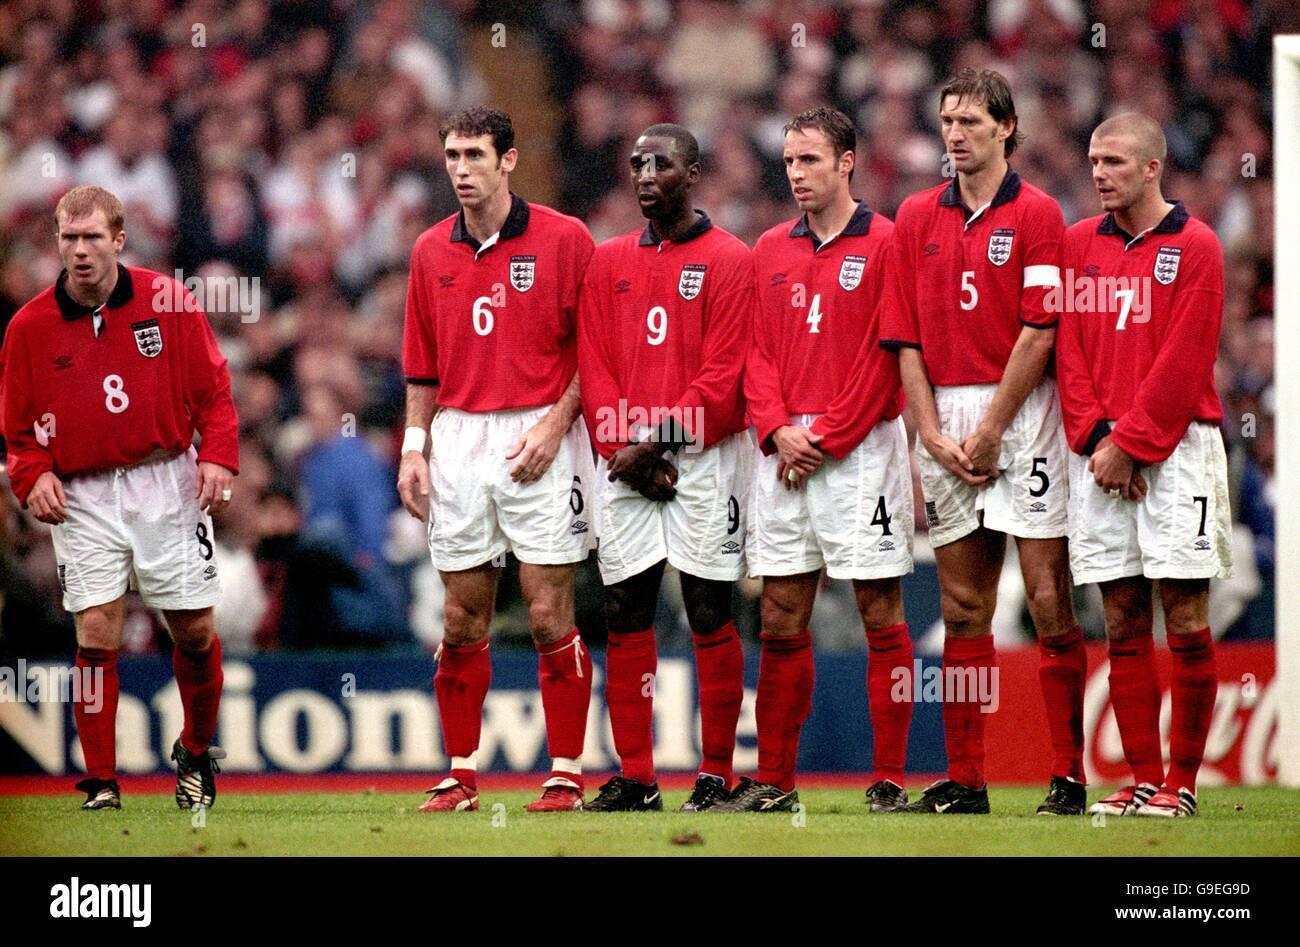 Soccer - World Cup 2002 Qualifier - Group Nine - England v Germany - Stock Image